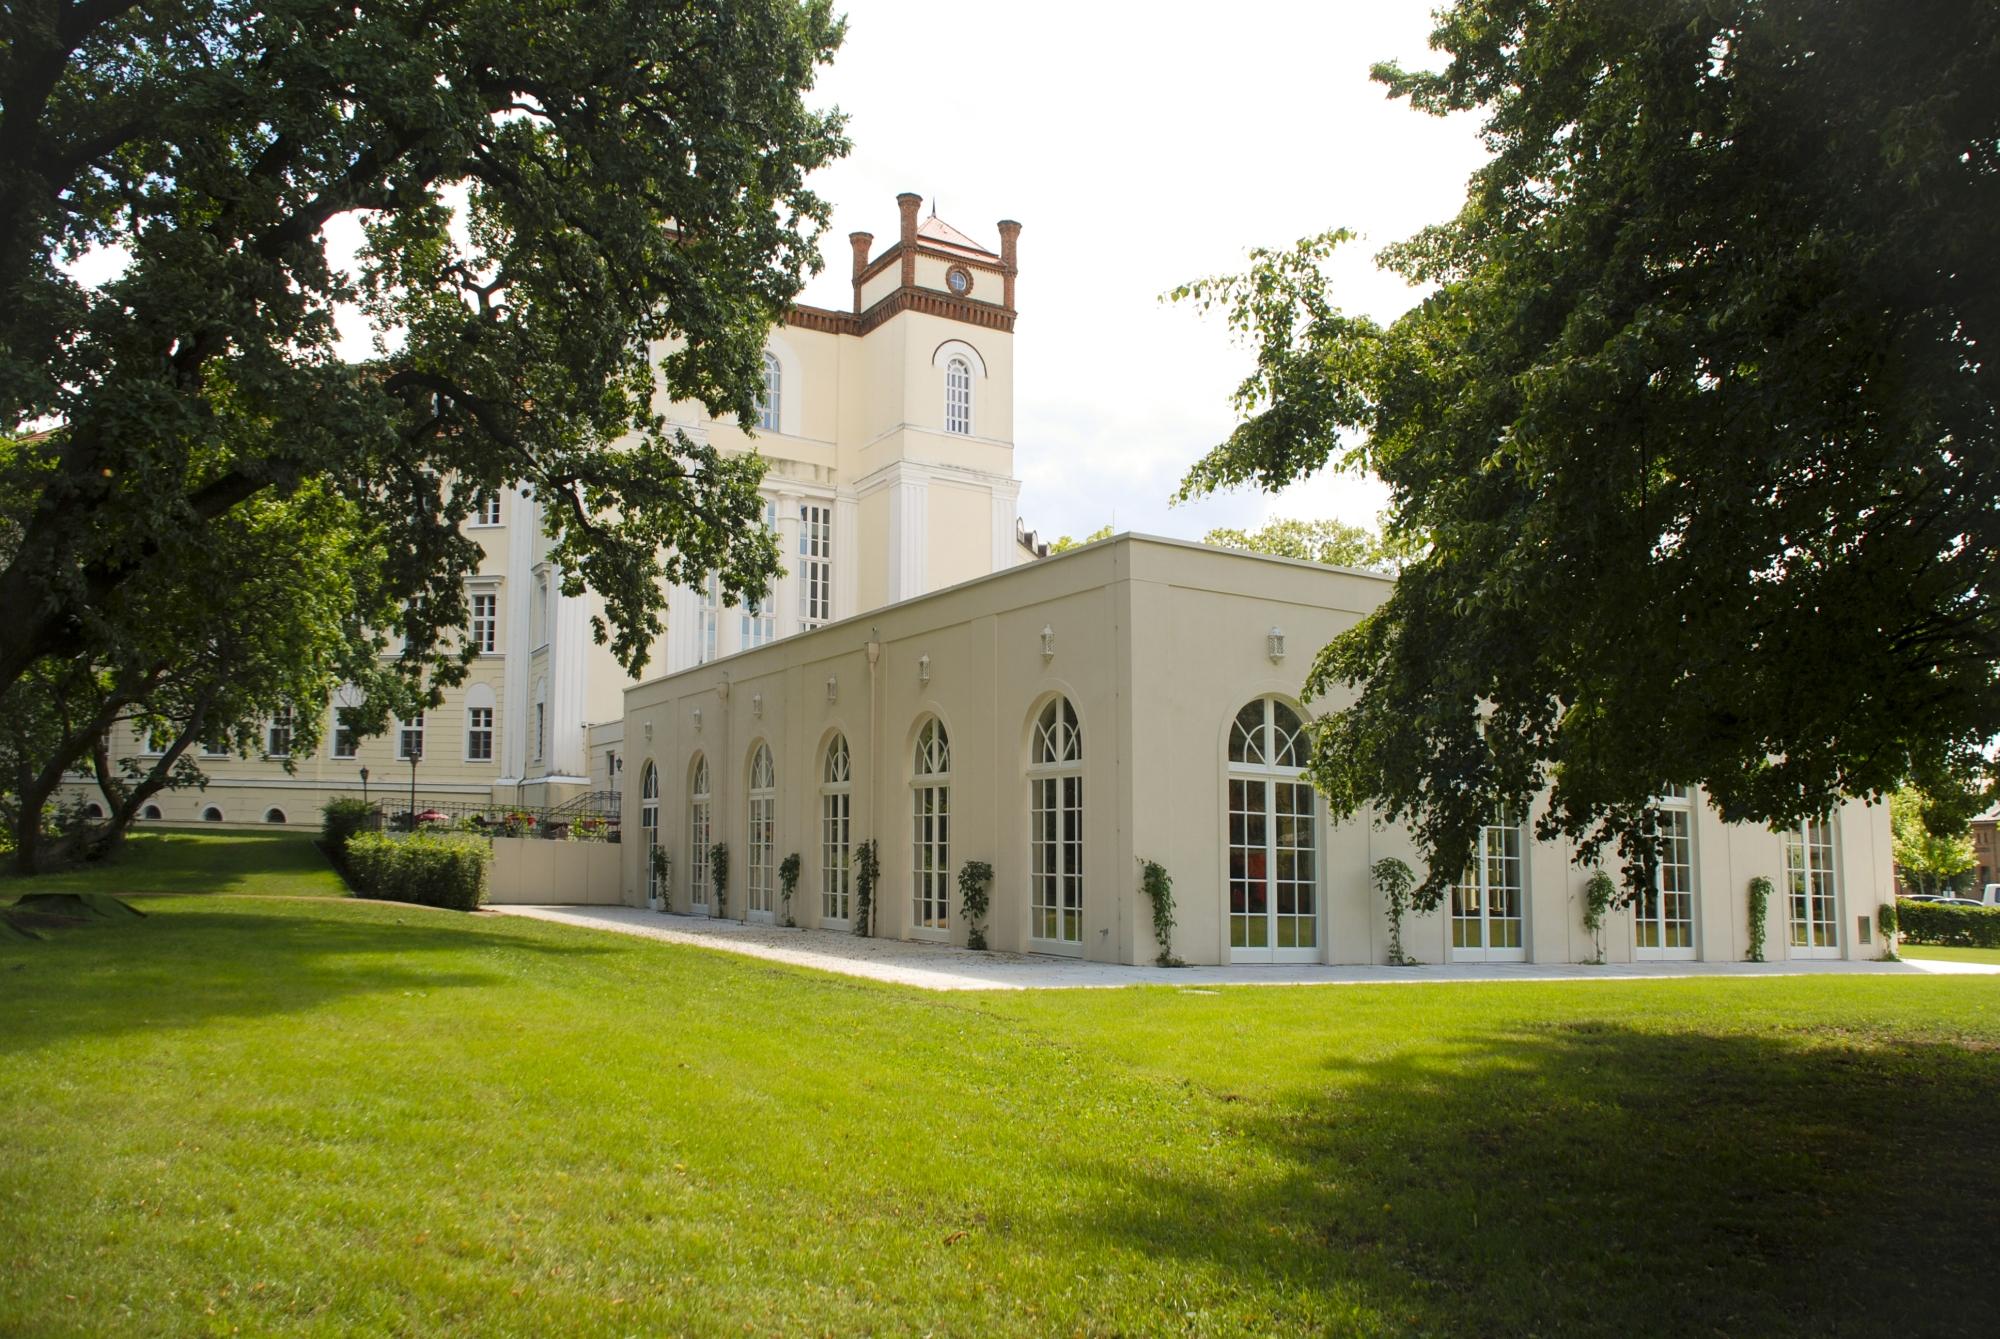 Dritter Flügel - Saal - Schloss Lübbenau im Spreewald